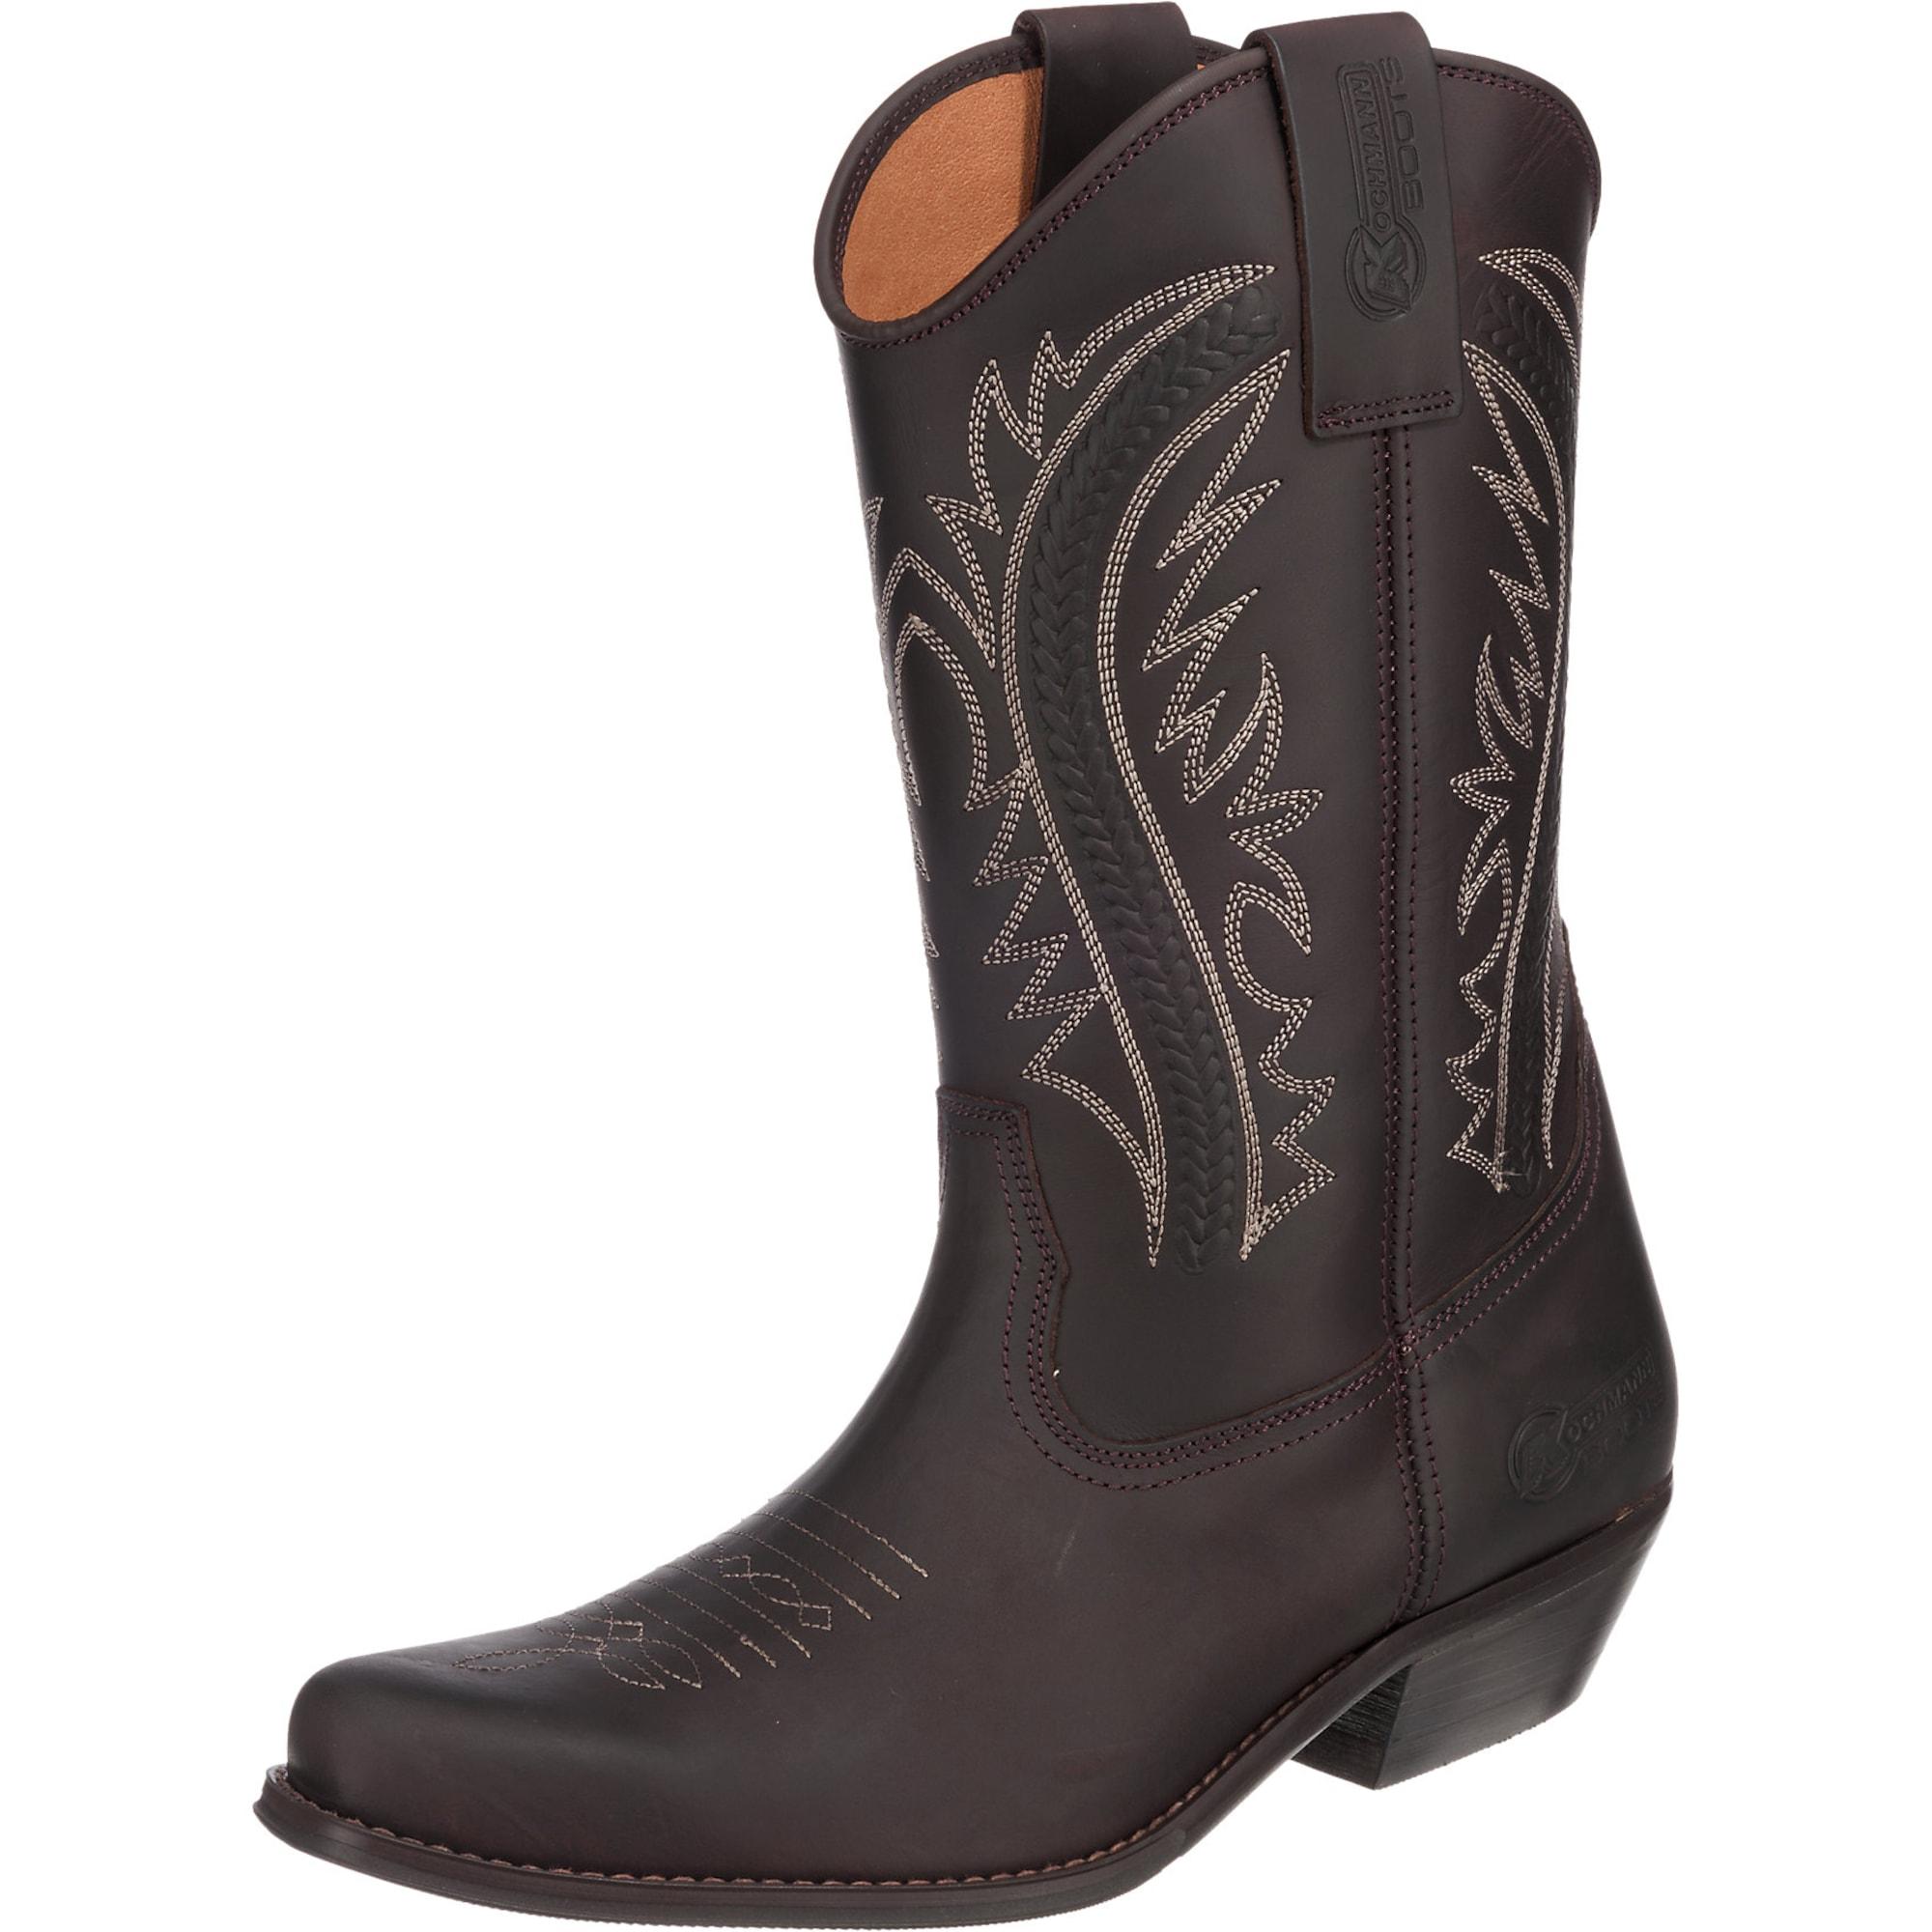 Westernstiefel 'Colorado' | Schuhe > Boots > Stiefel | Kochmann